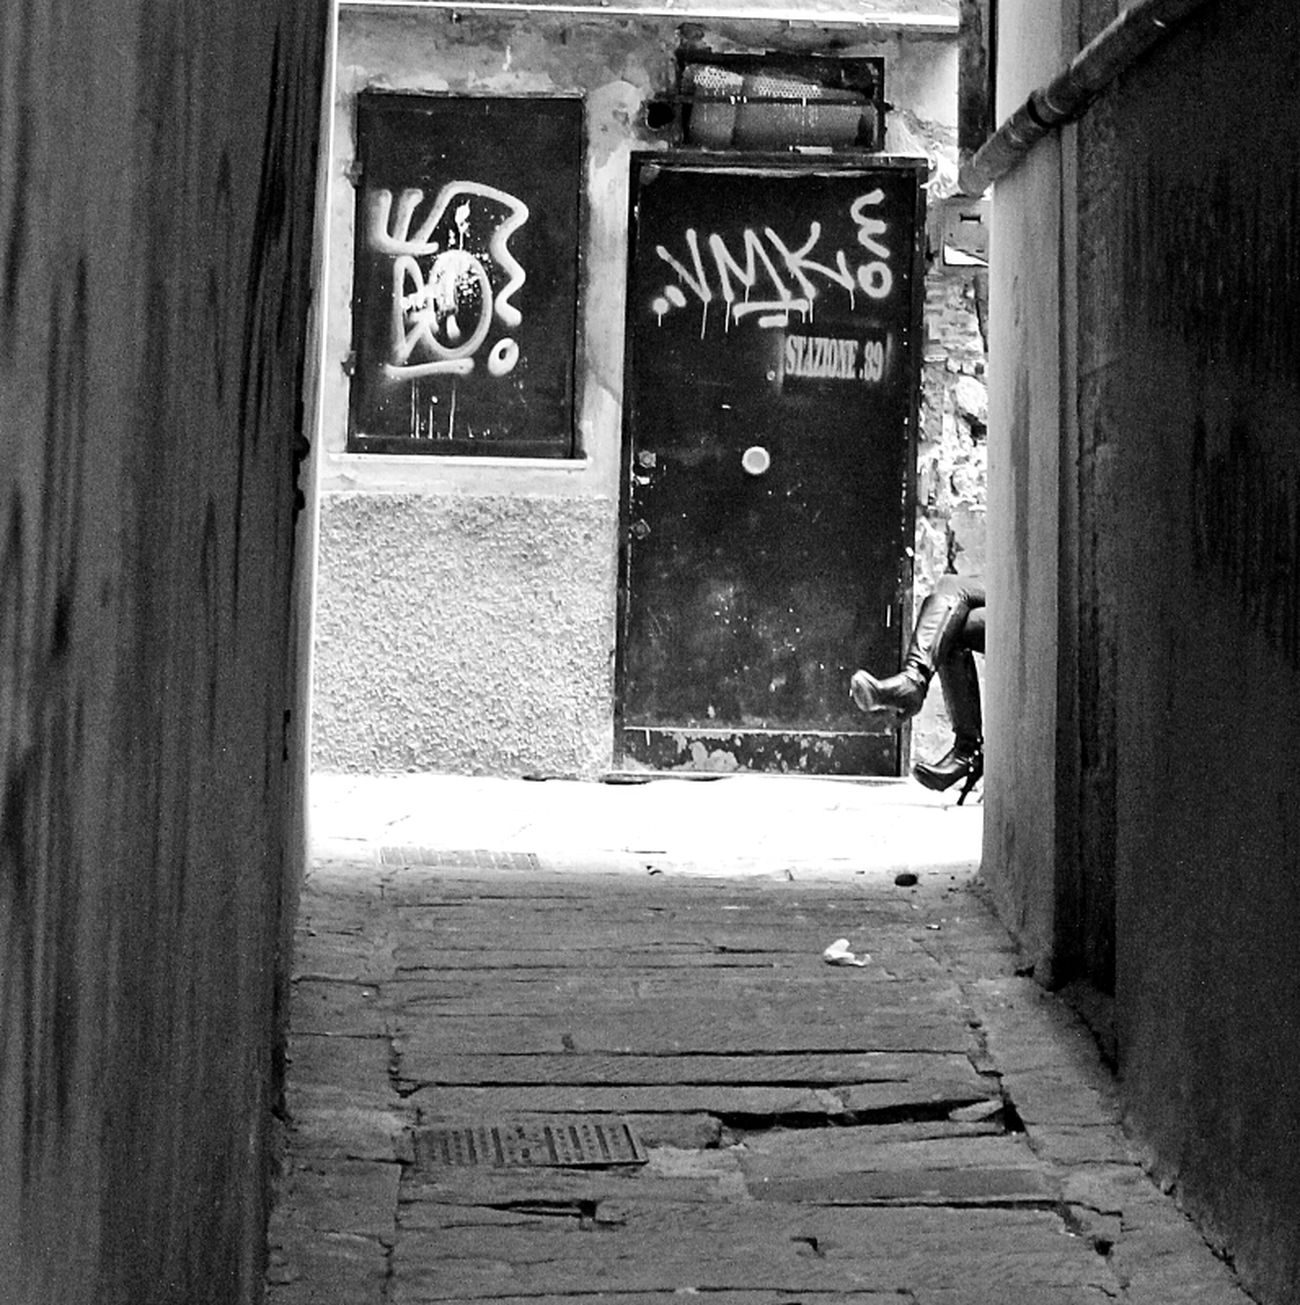 Street Streetphotography Blackandwhite Street Life On The Streets Streetphoto_bw Genova Bws_worldwide Italianbrother Eye4photography